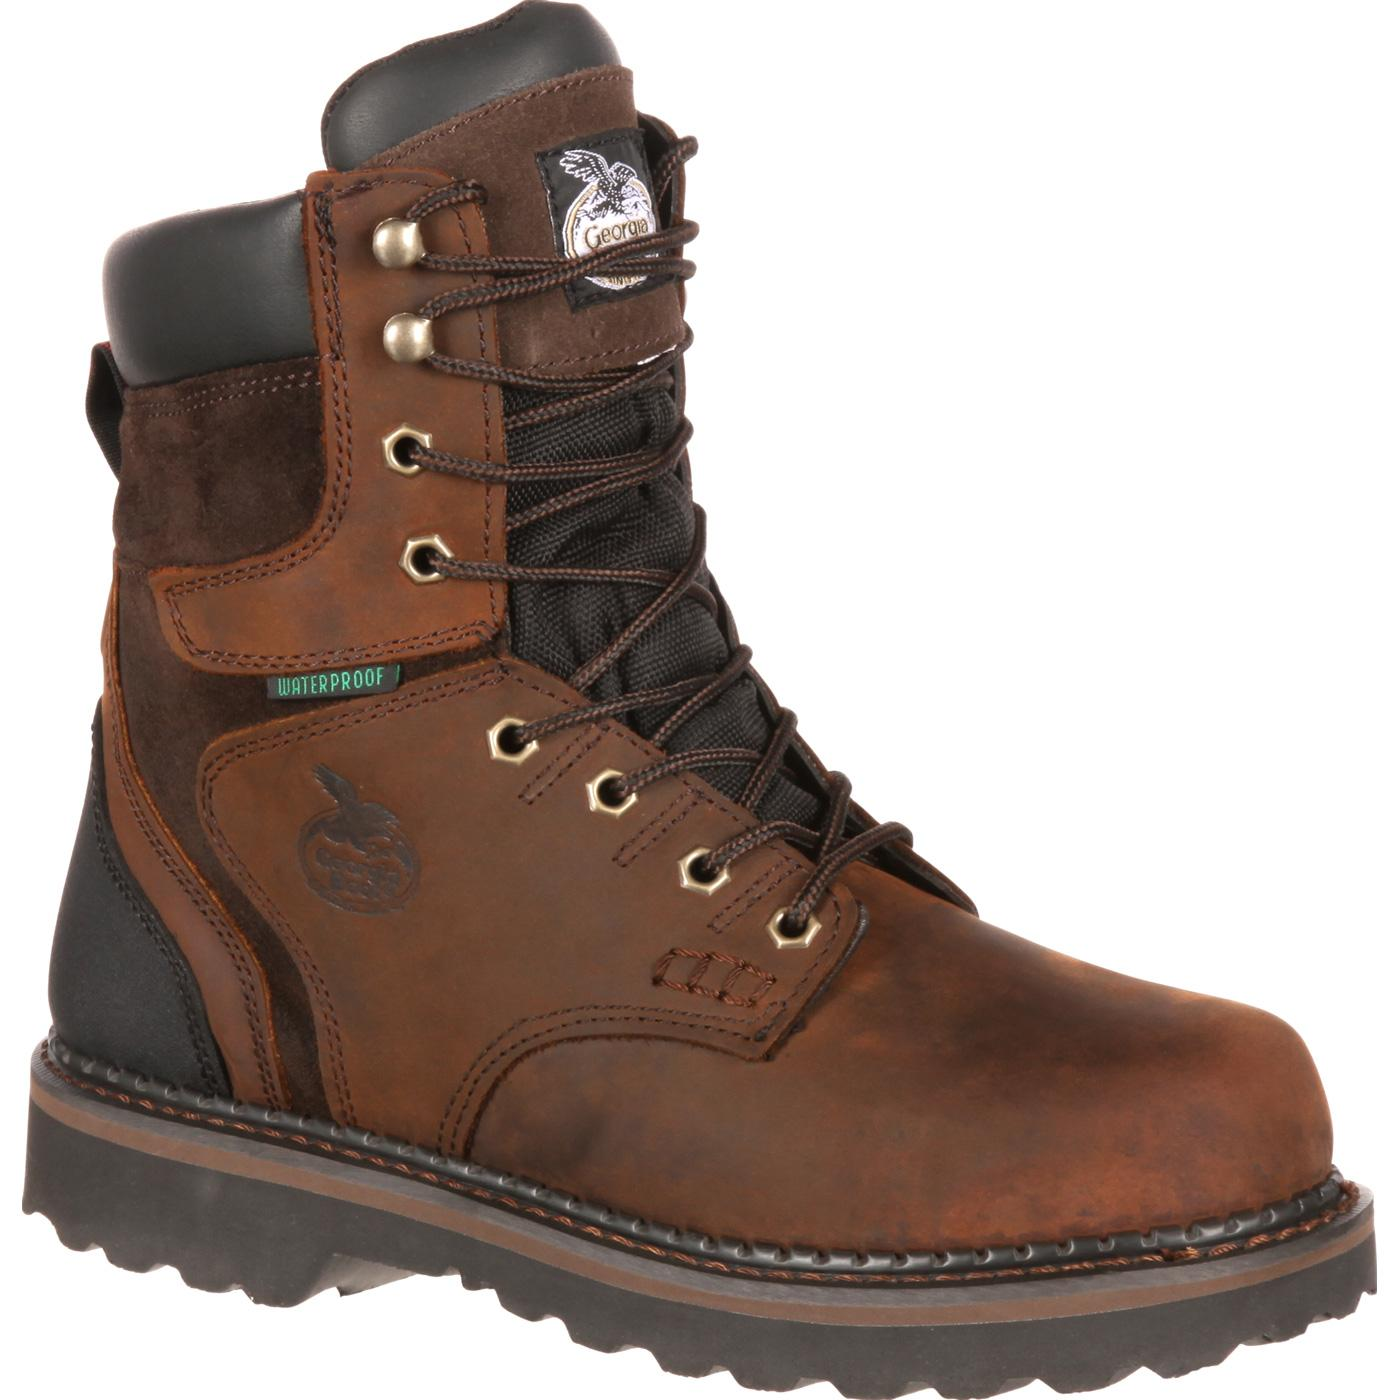 a315990ca191 Georgia Boot  Men s 8